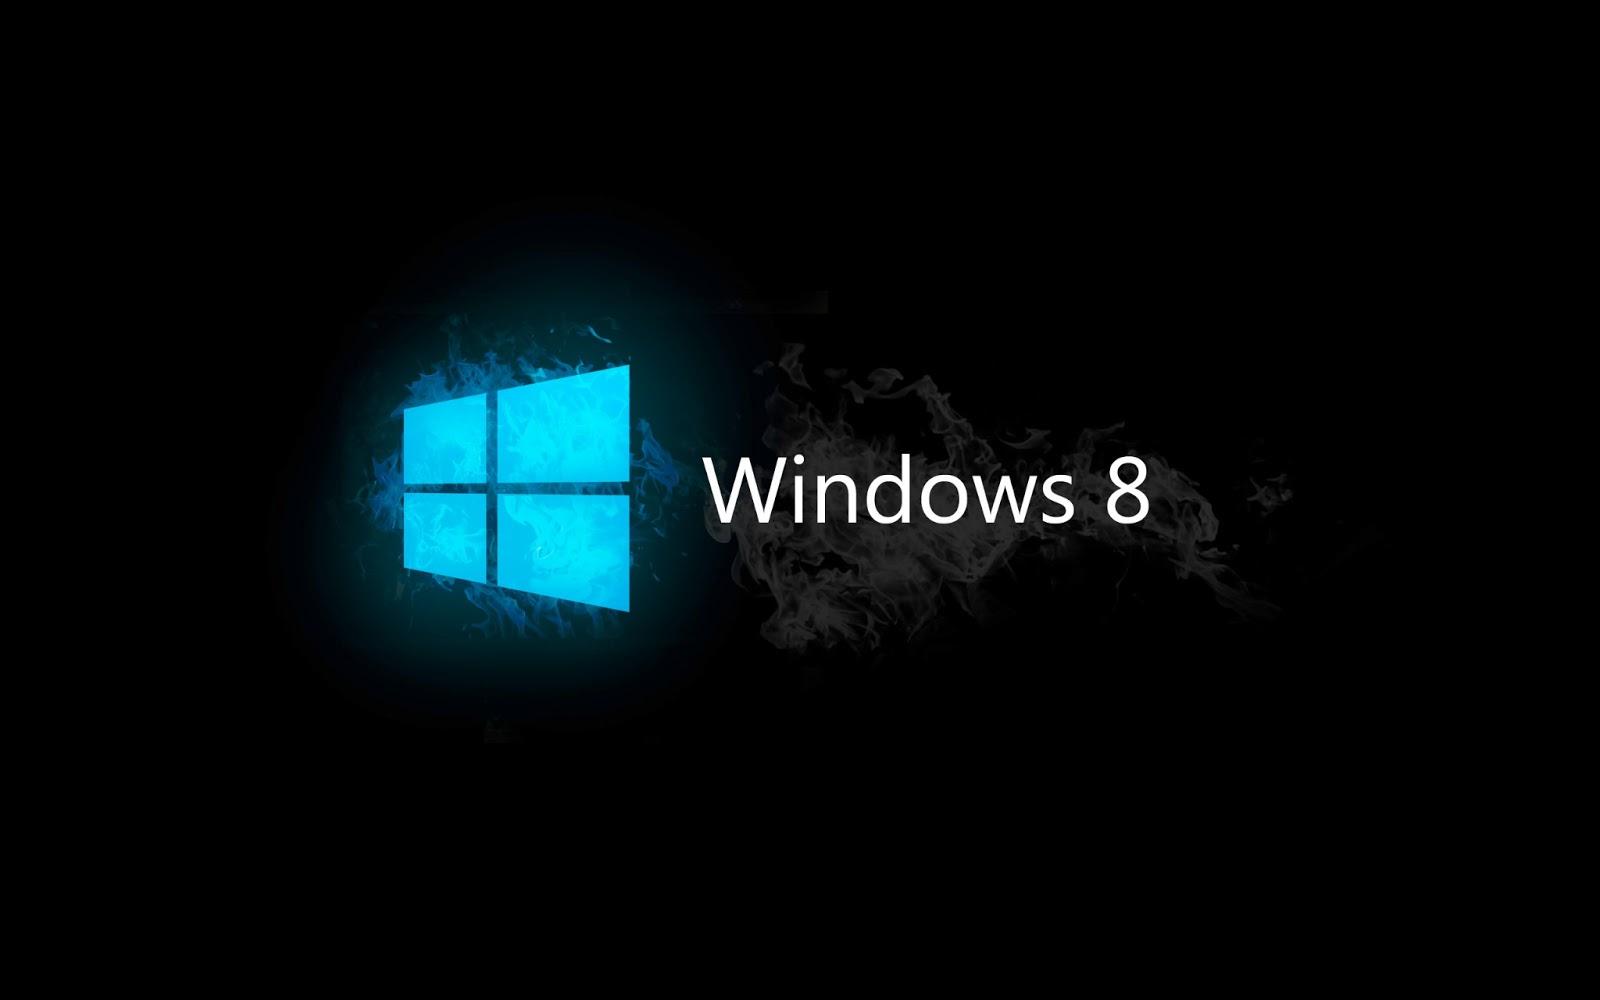 Hd pc desktop wallpapers windows 8 desktop wallpaper - Hd wallpapers for pc windows ...